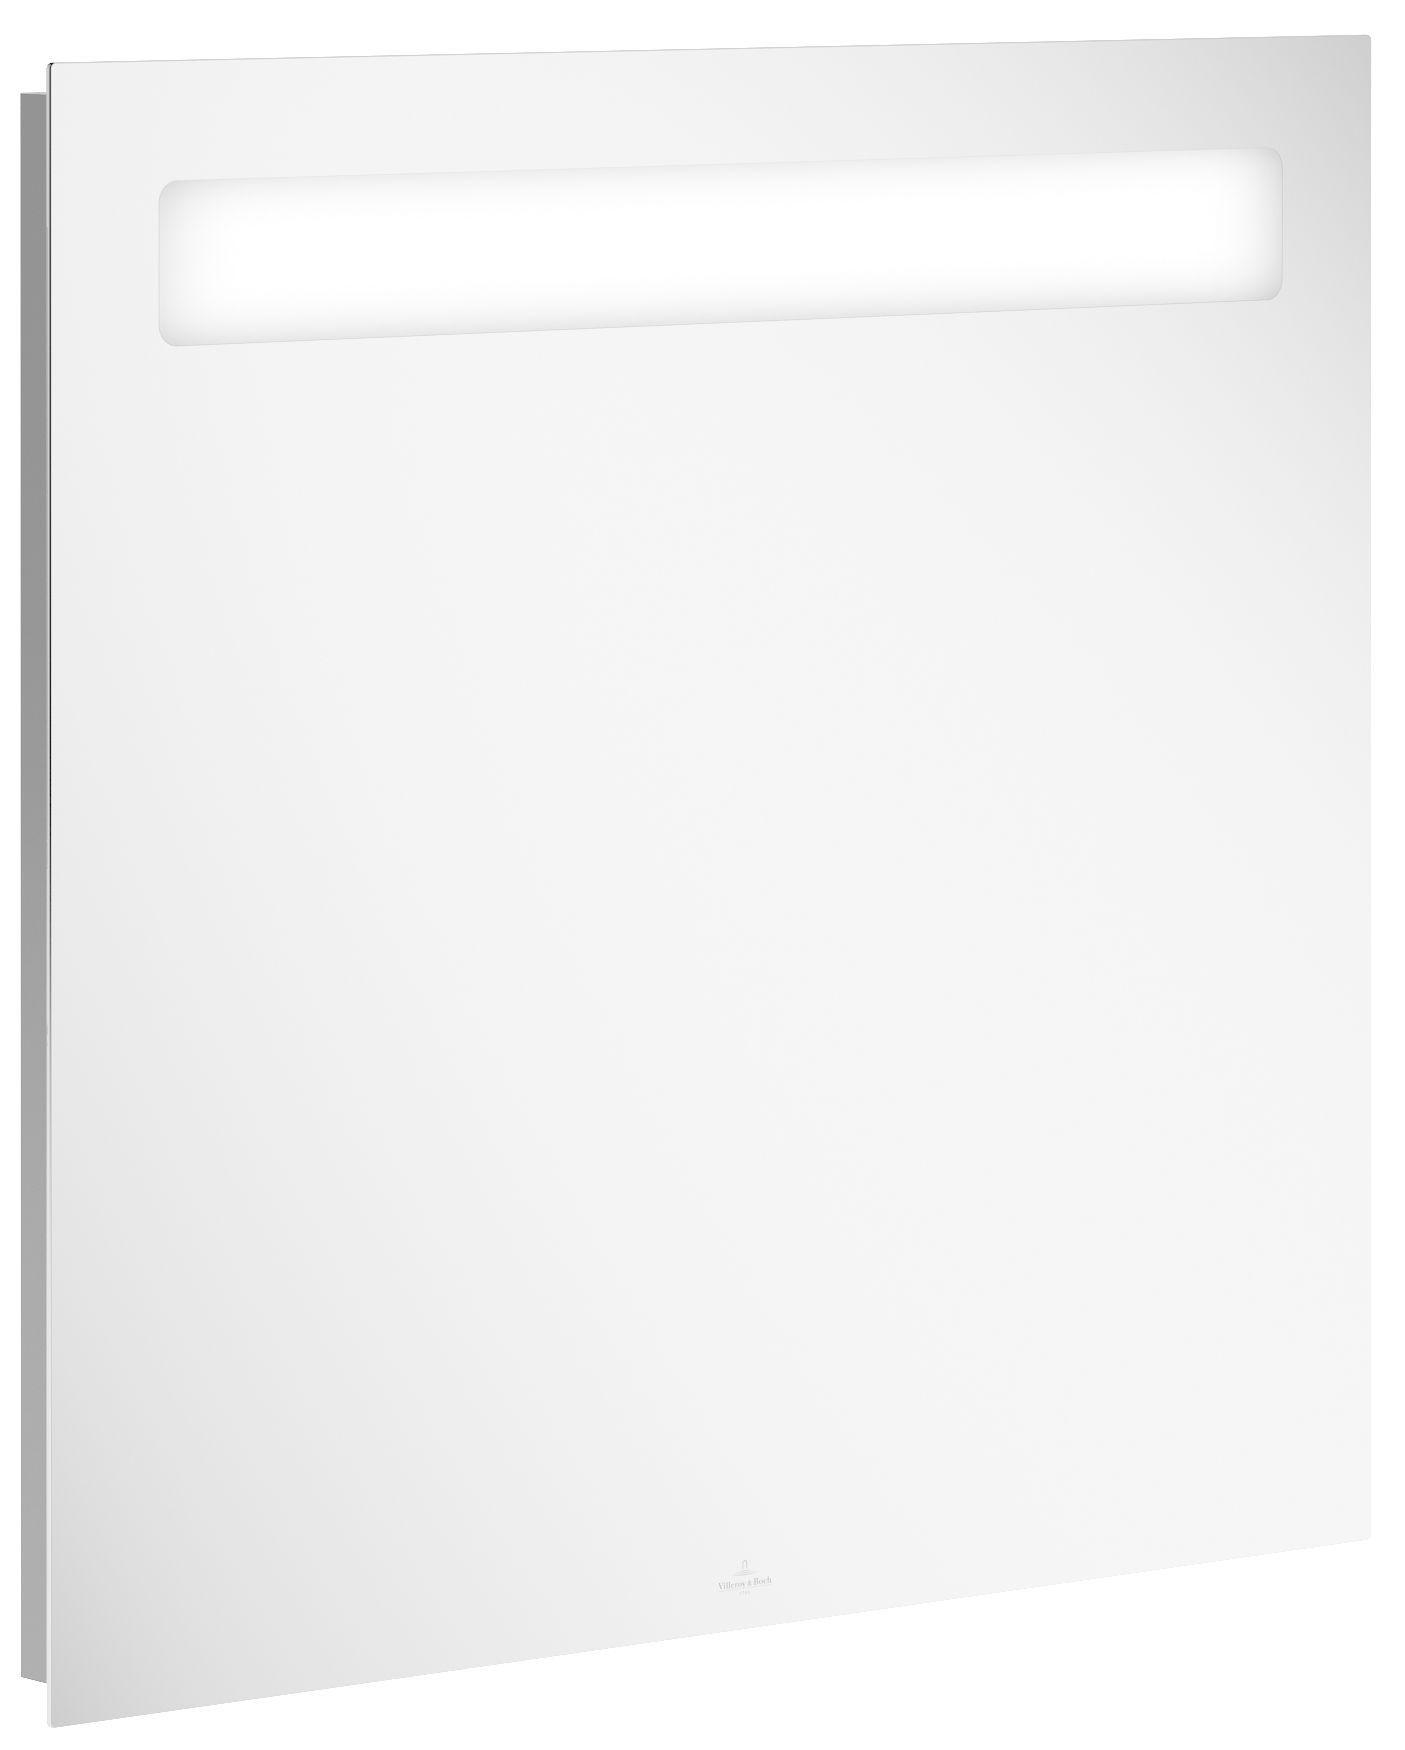 Villeroy & Boch More to See 14 Spiegel mit Beleuchtung  B:80xH:75xT:4,7cm A4328000